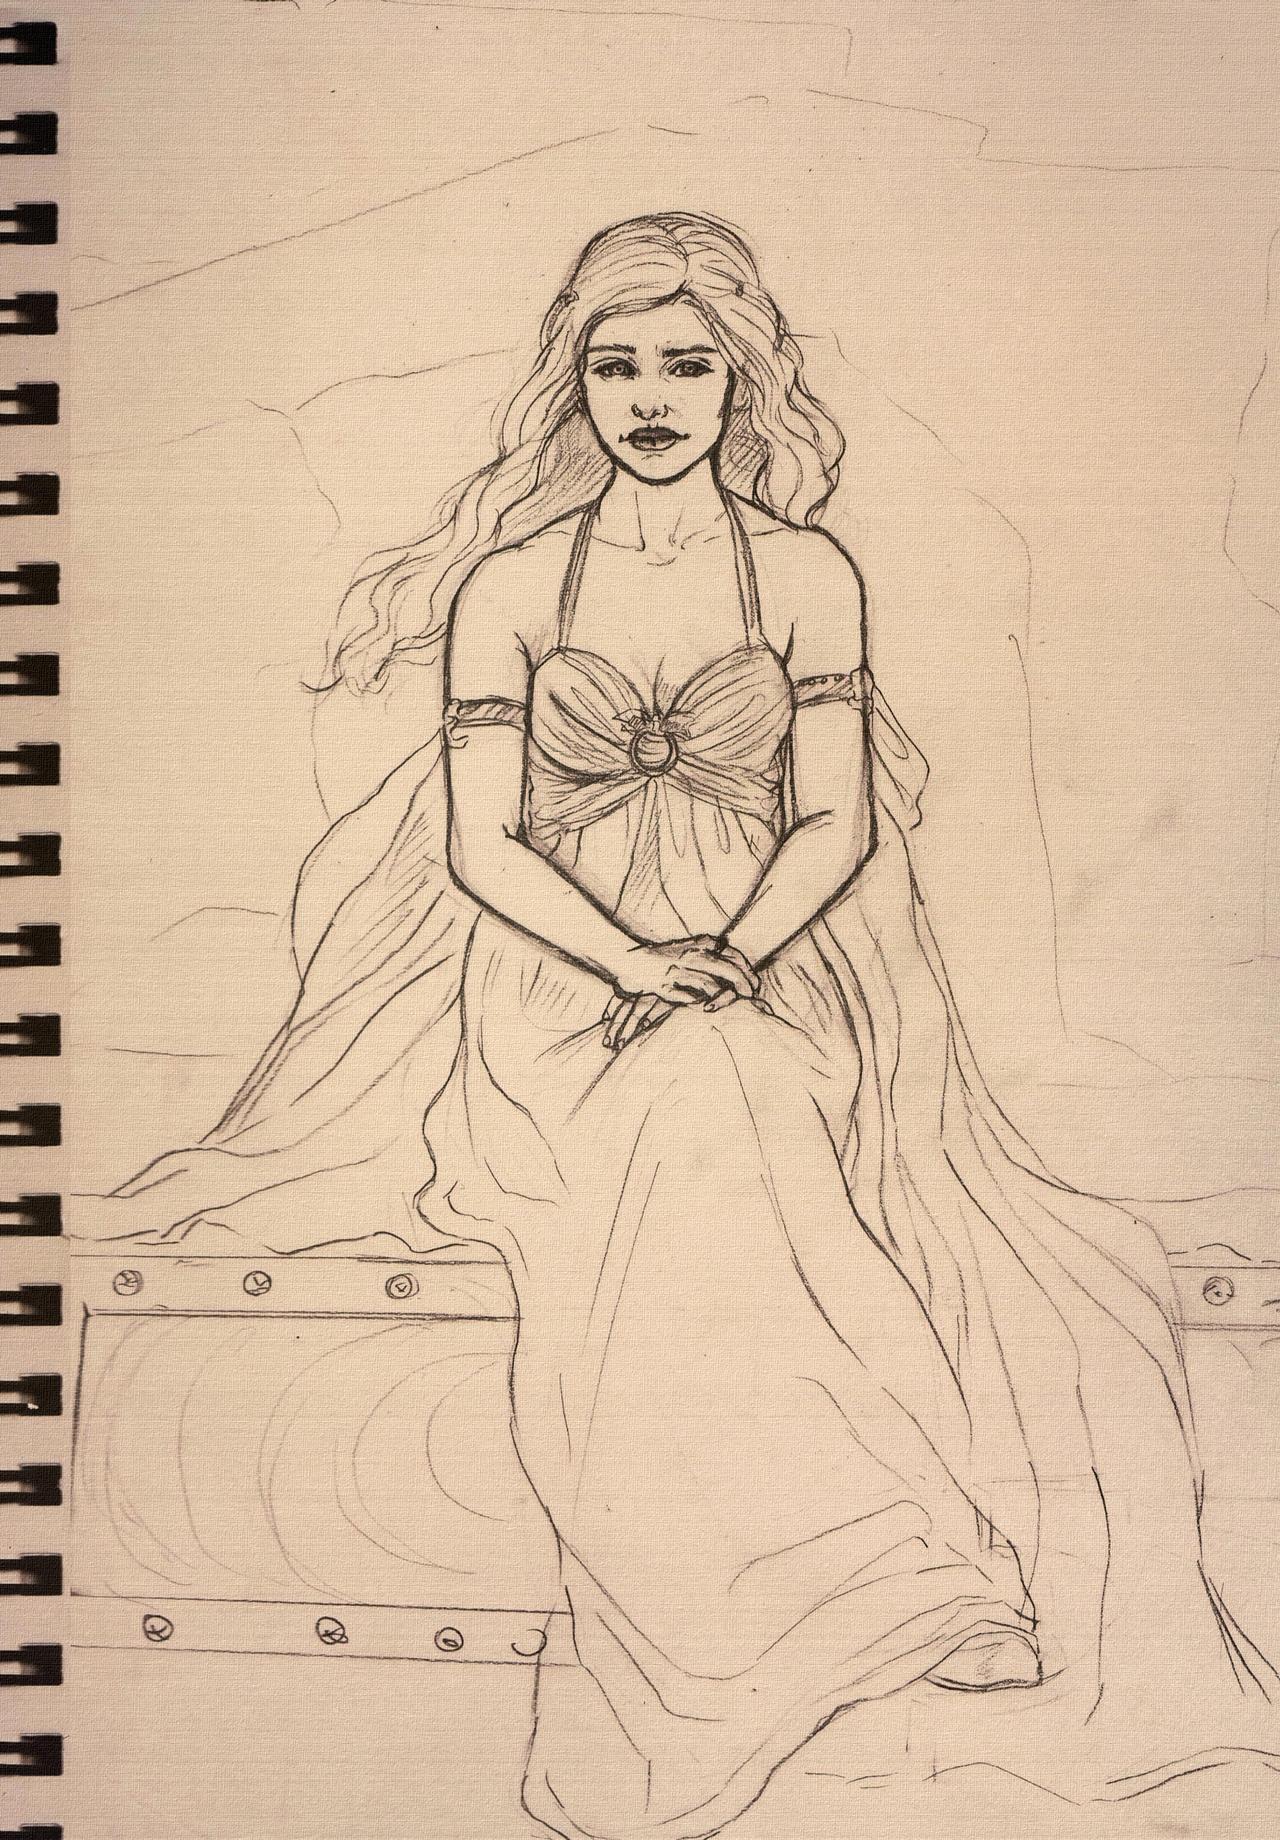 Khaleesi 001 by LuanaVecchio